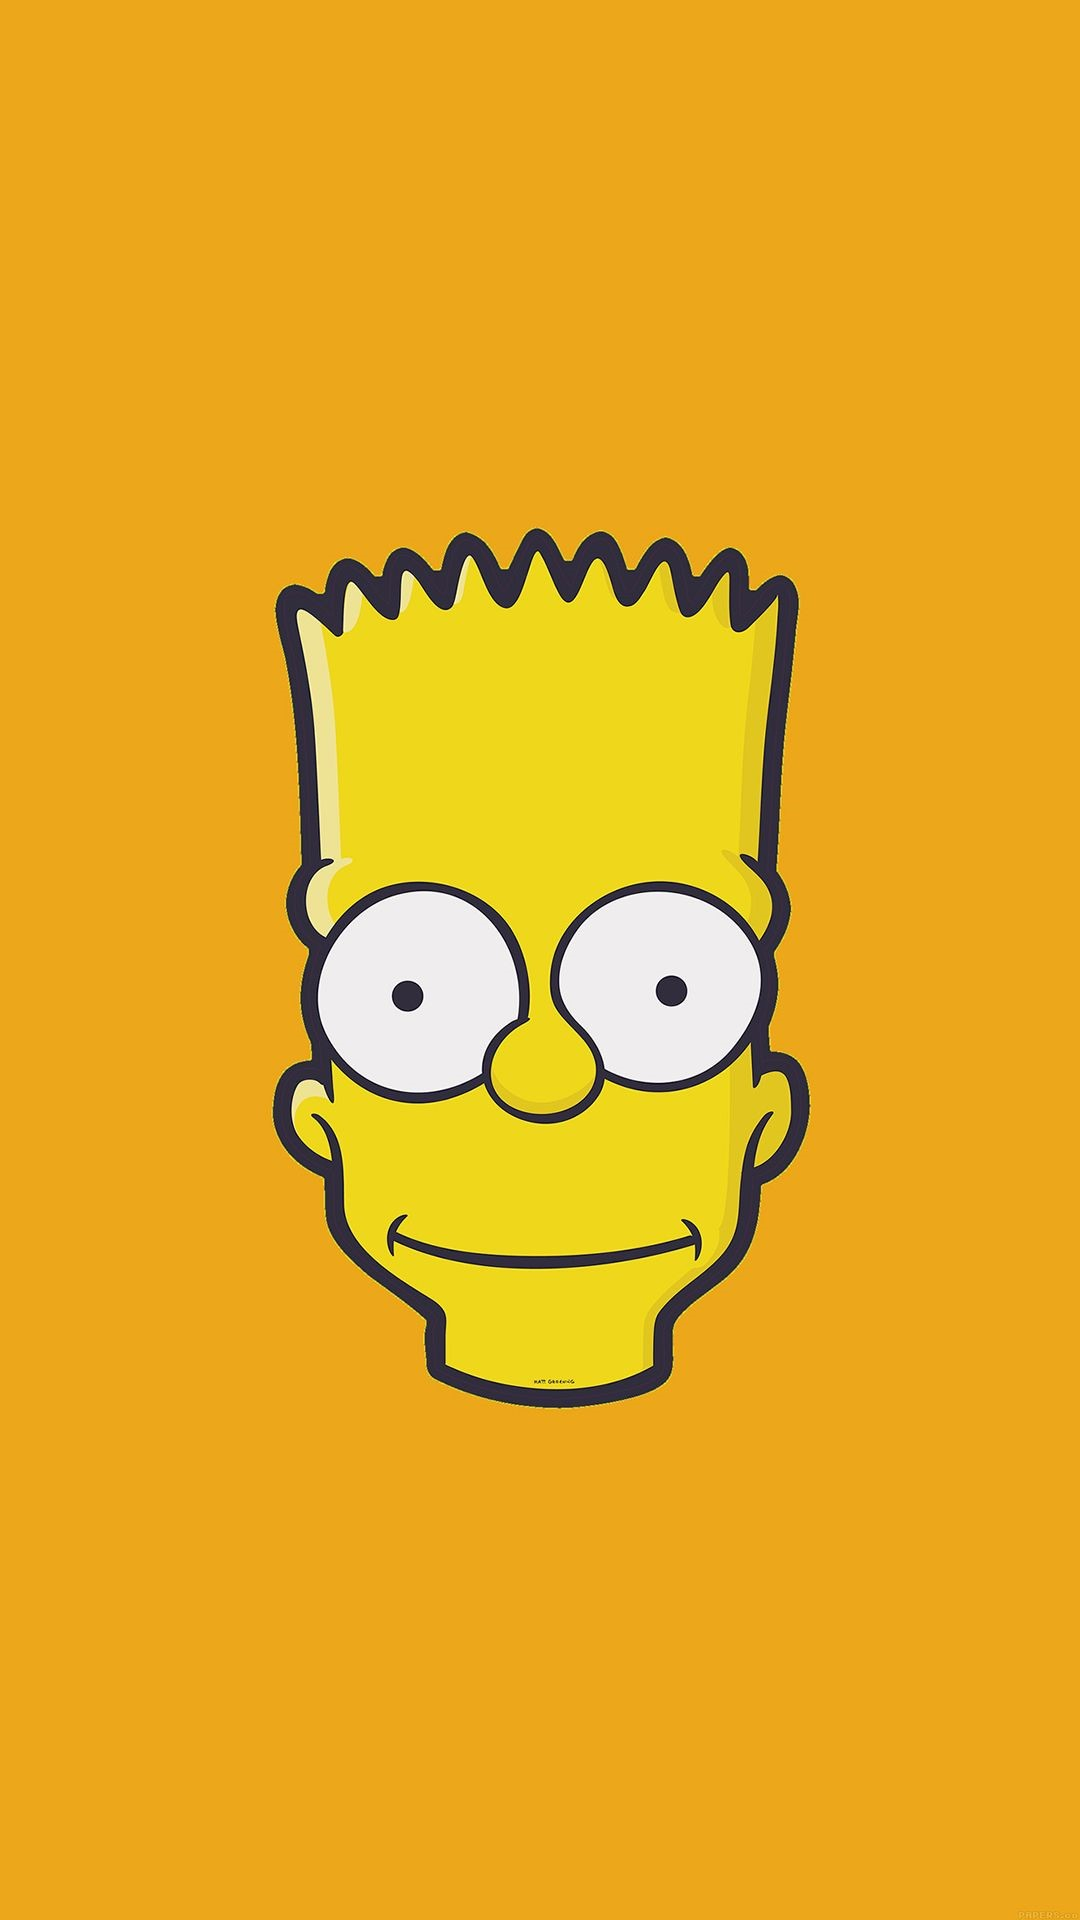 Simpsons Photos